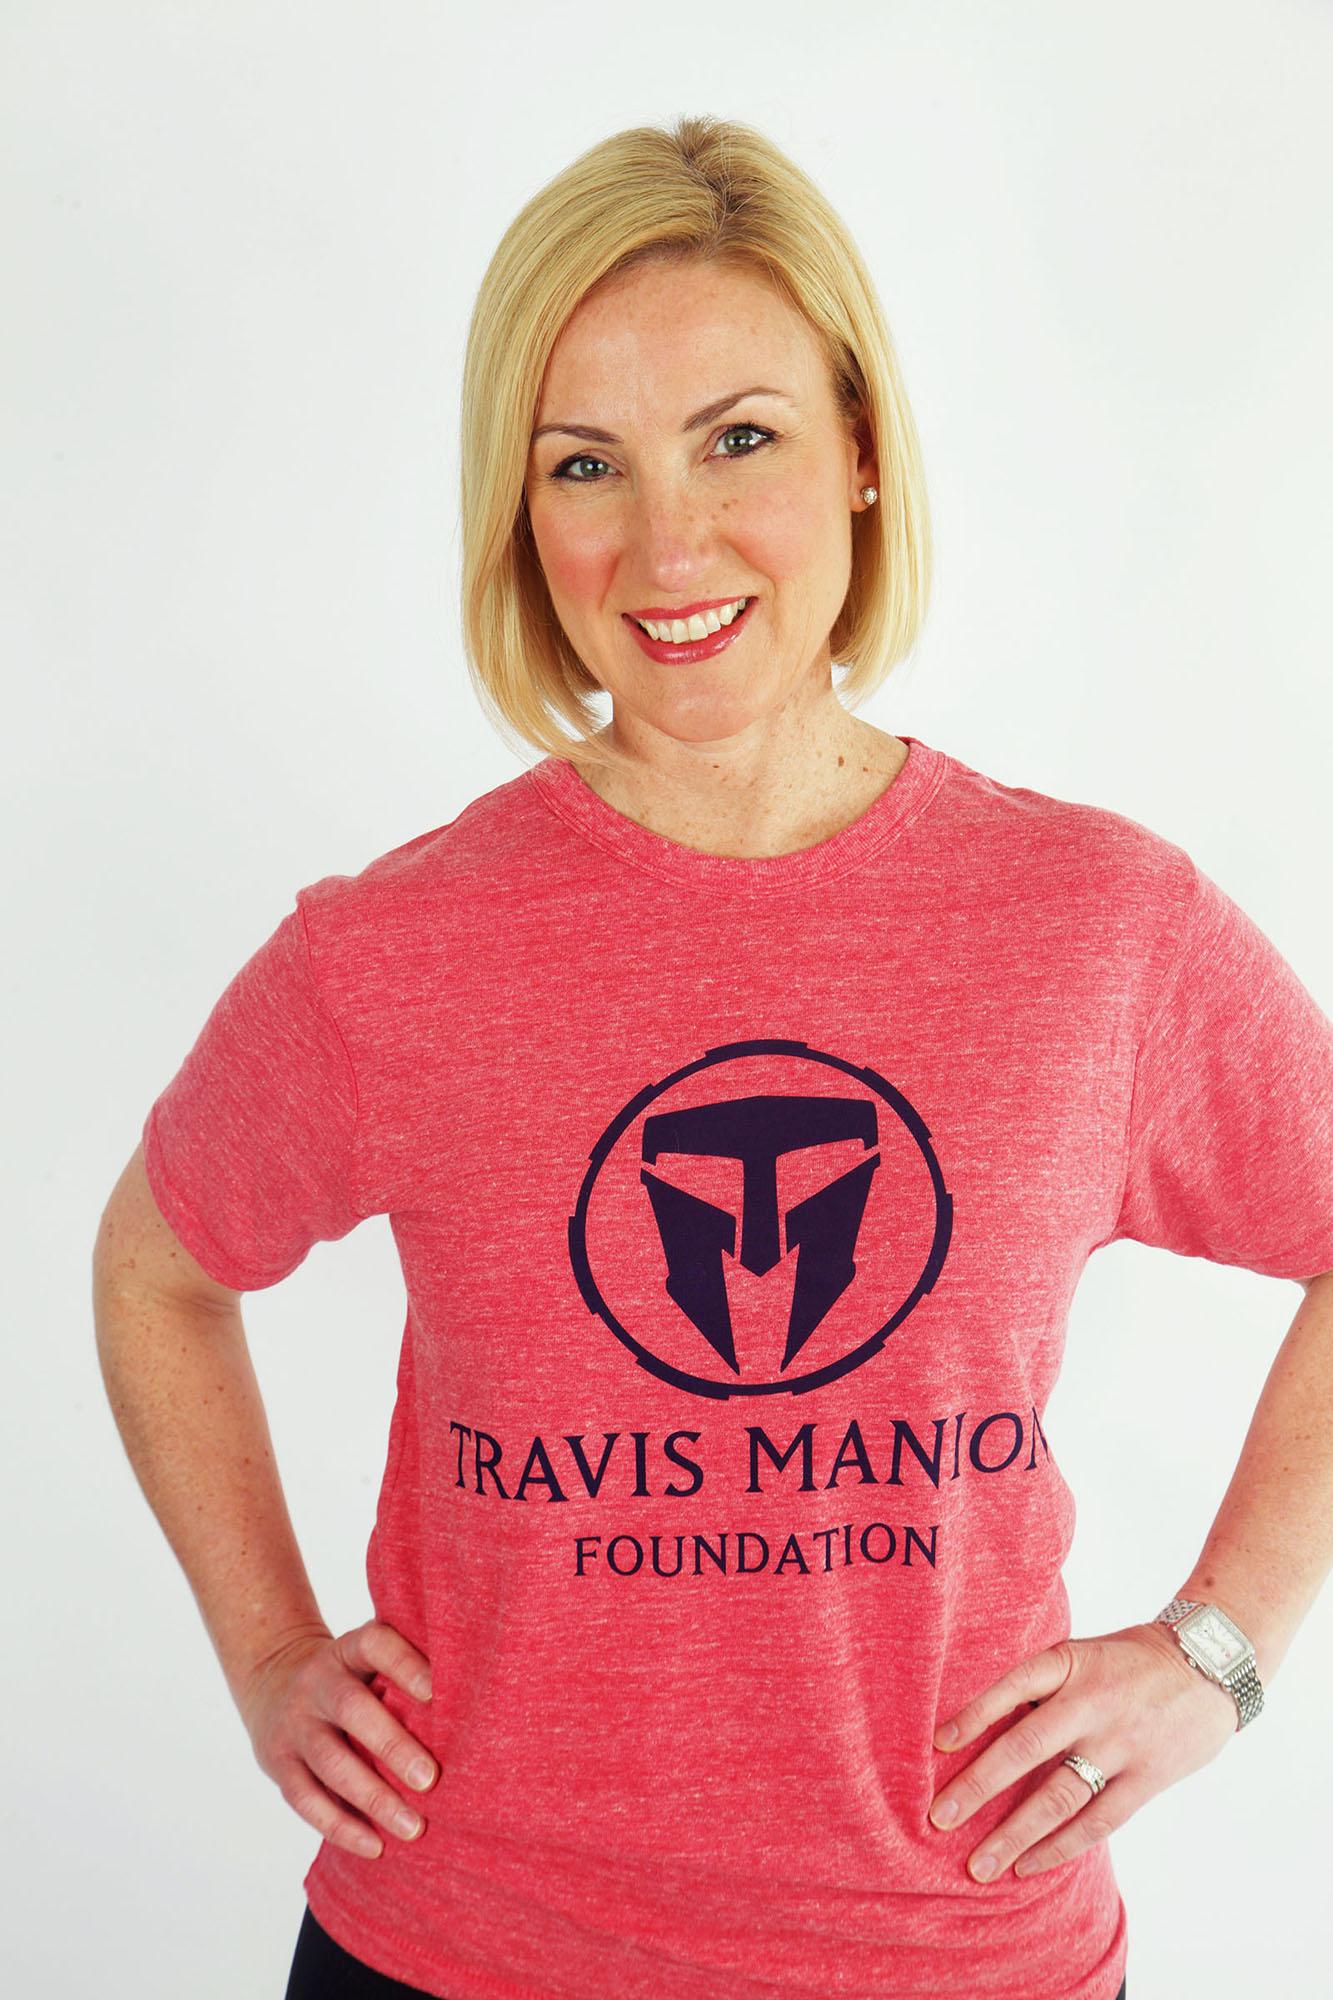 Travis Manion Foundation Twisted Tri-Tee